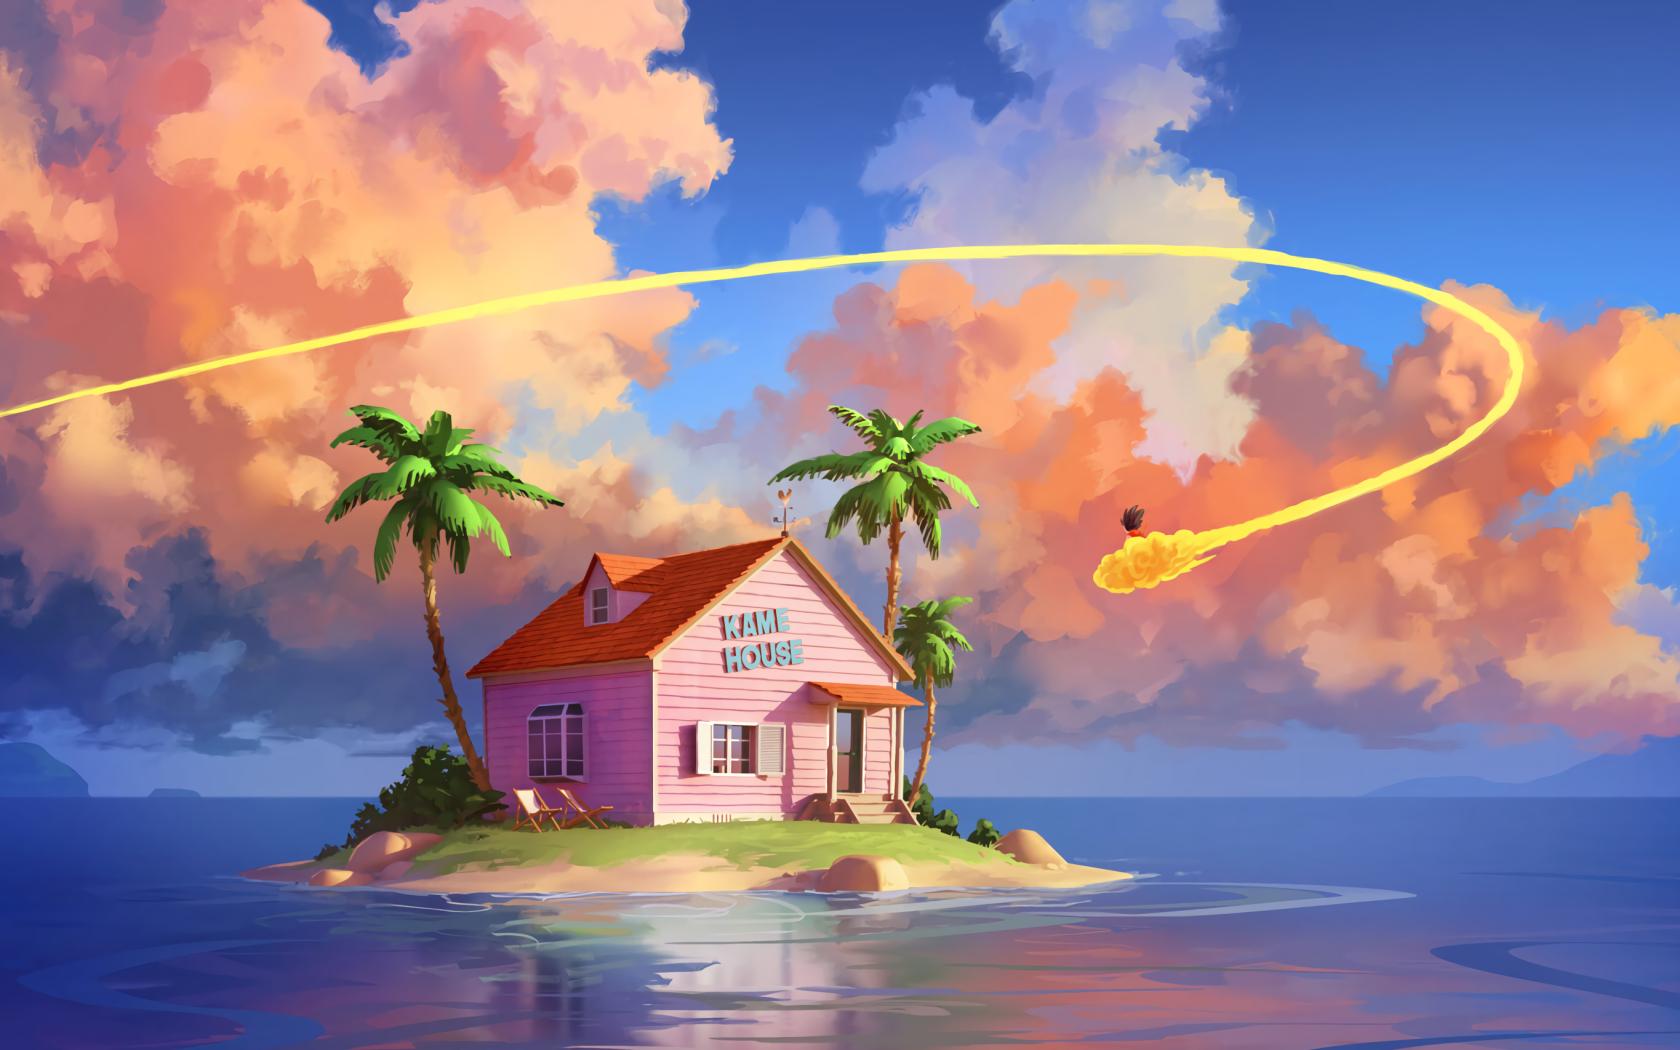 1680x1050 Kame House Dragon Ball Z 1680x1050 Resolution ...